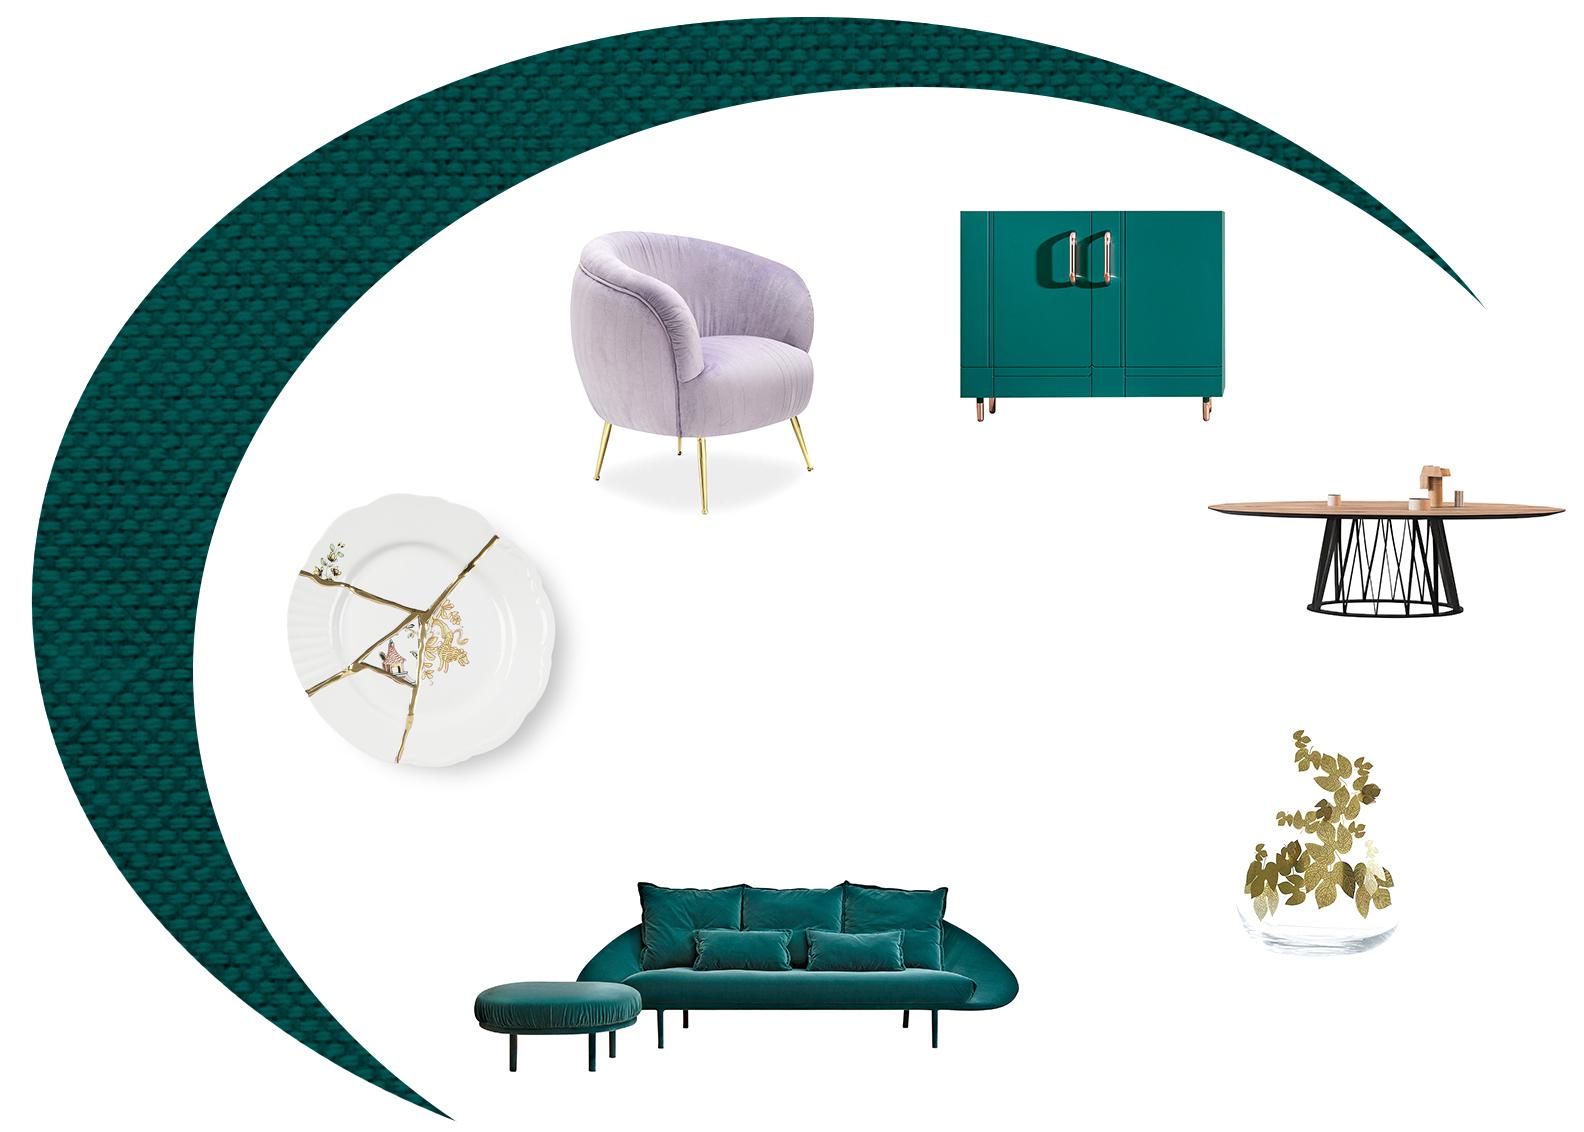 Miniforms Lem Sofa, Dalila Sideboard, Acco Dining Table, Vase, Armchair